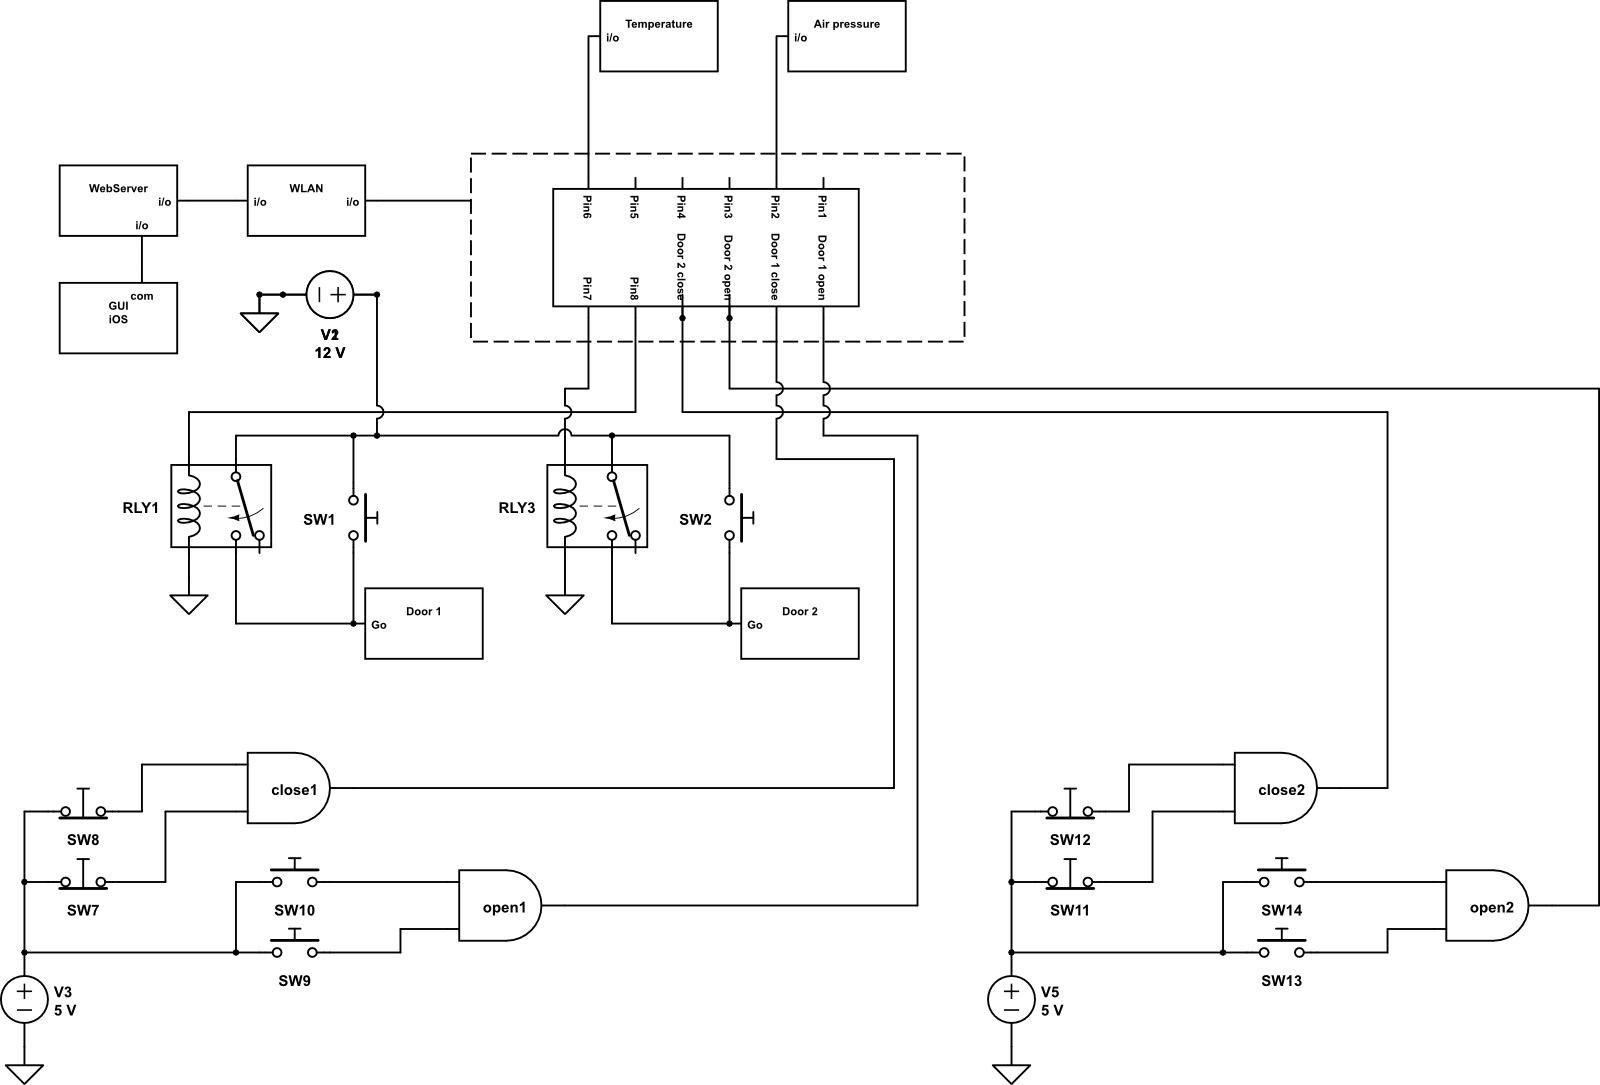 Fantastisch Handwerker Garagentor Sensor Schaltplan Bilder ...